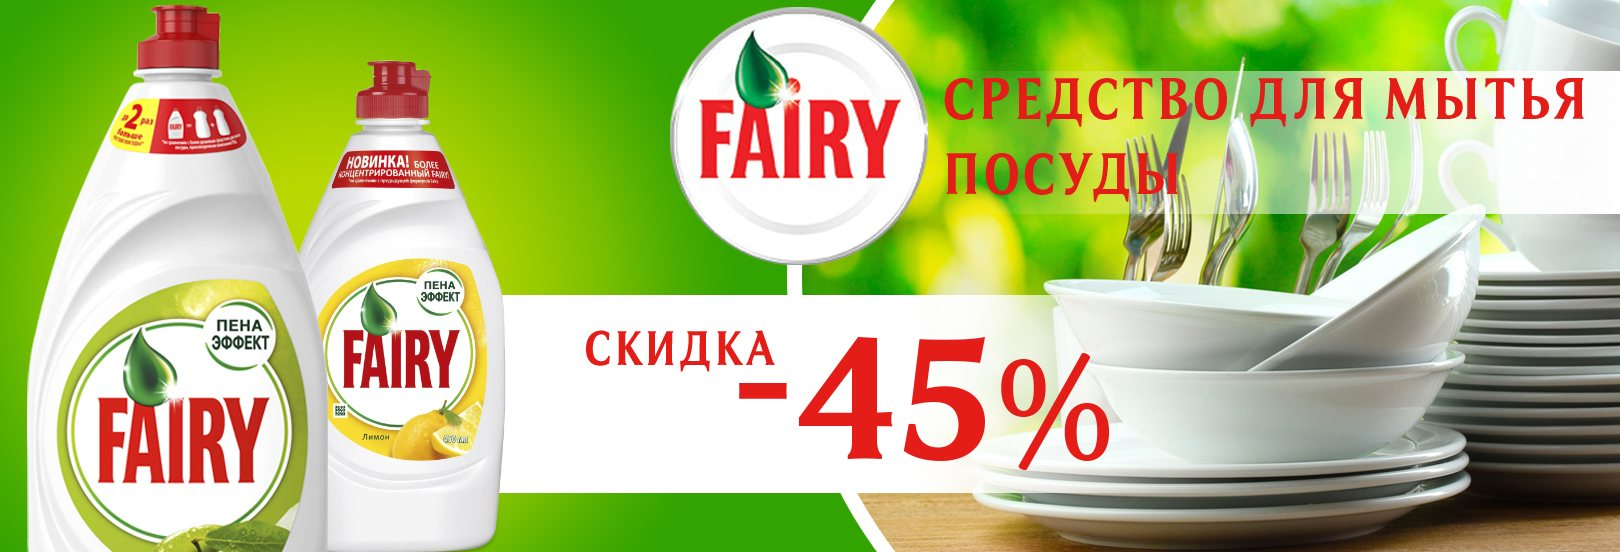 fairy - 45%